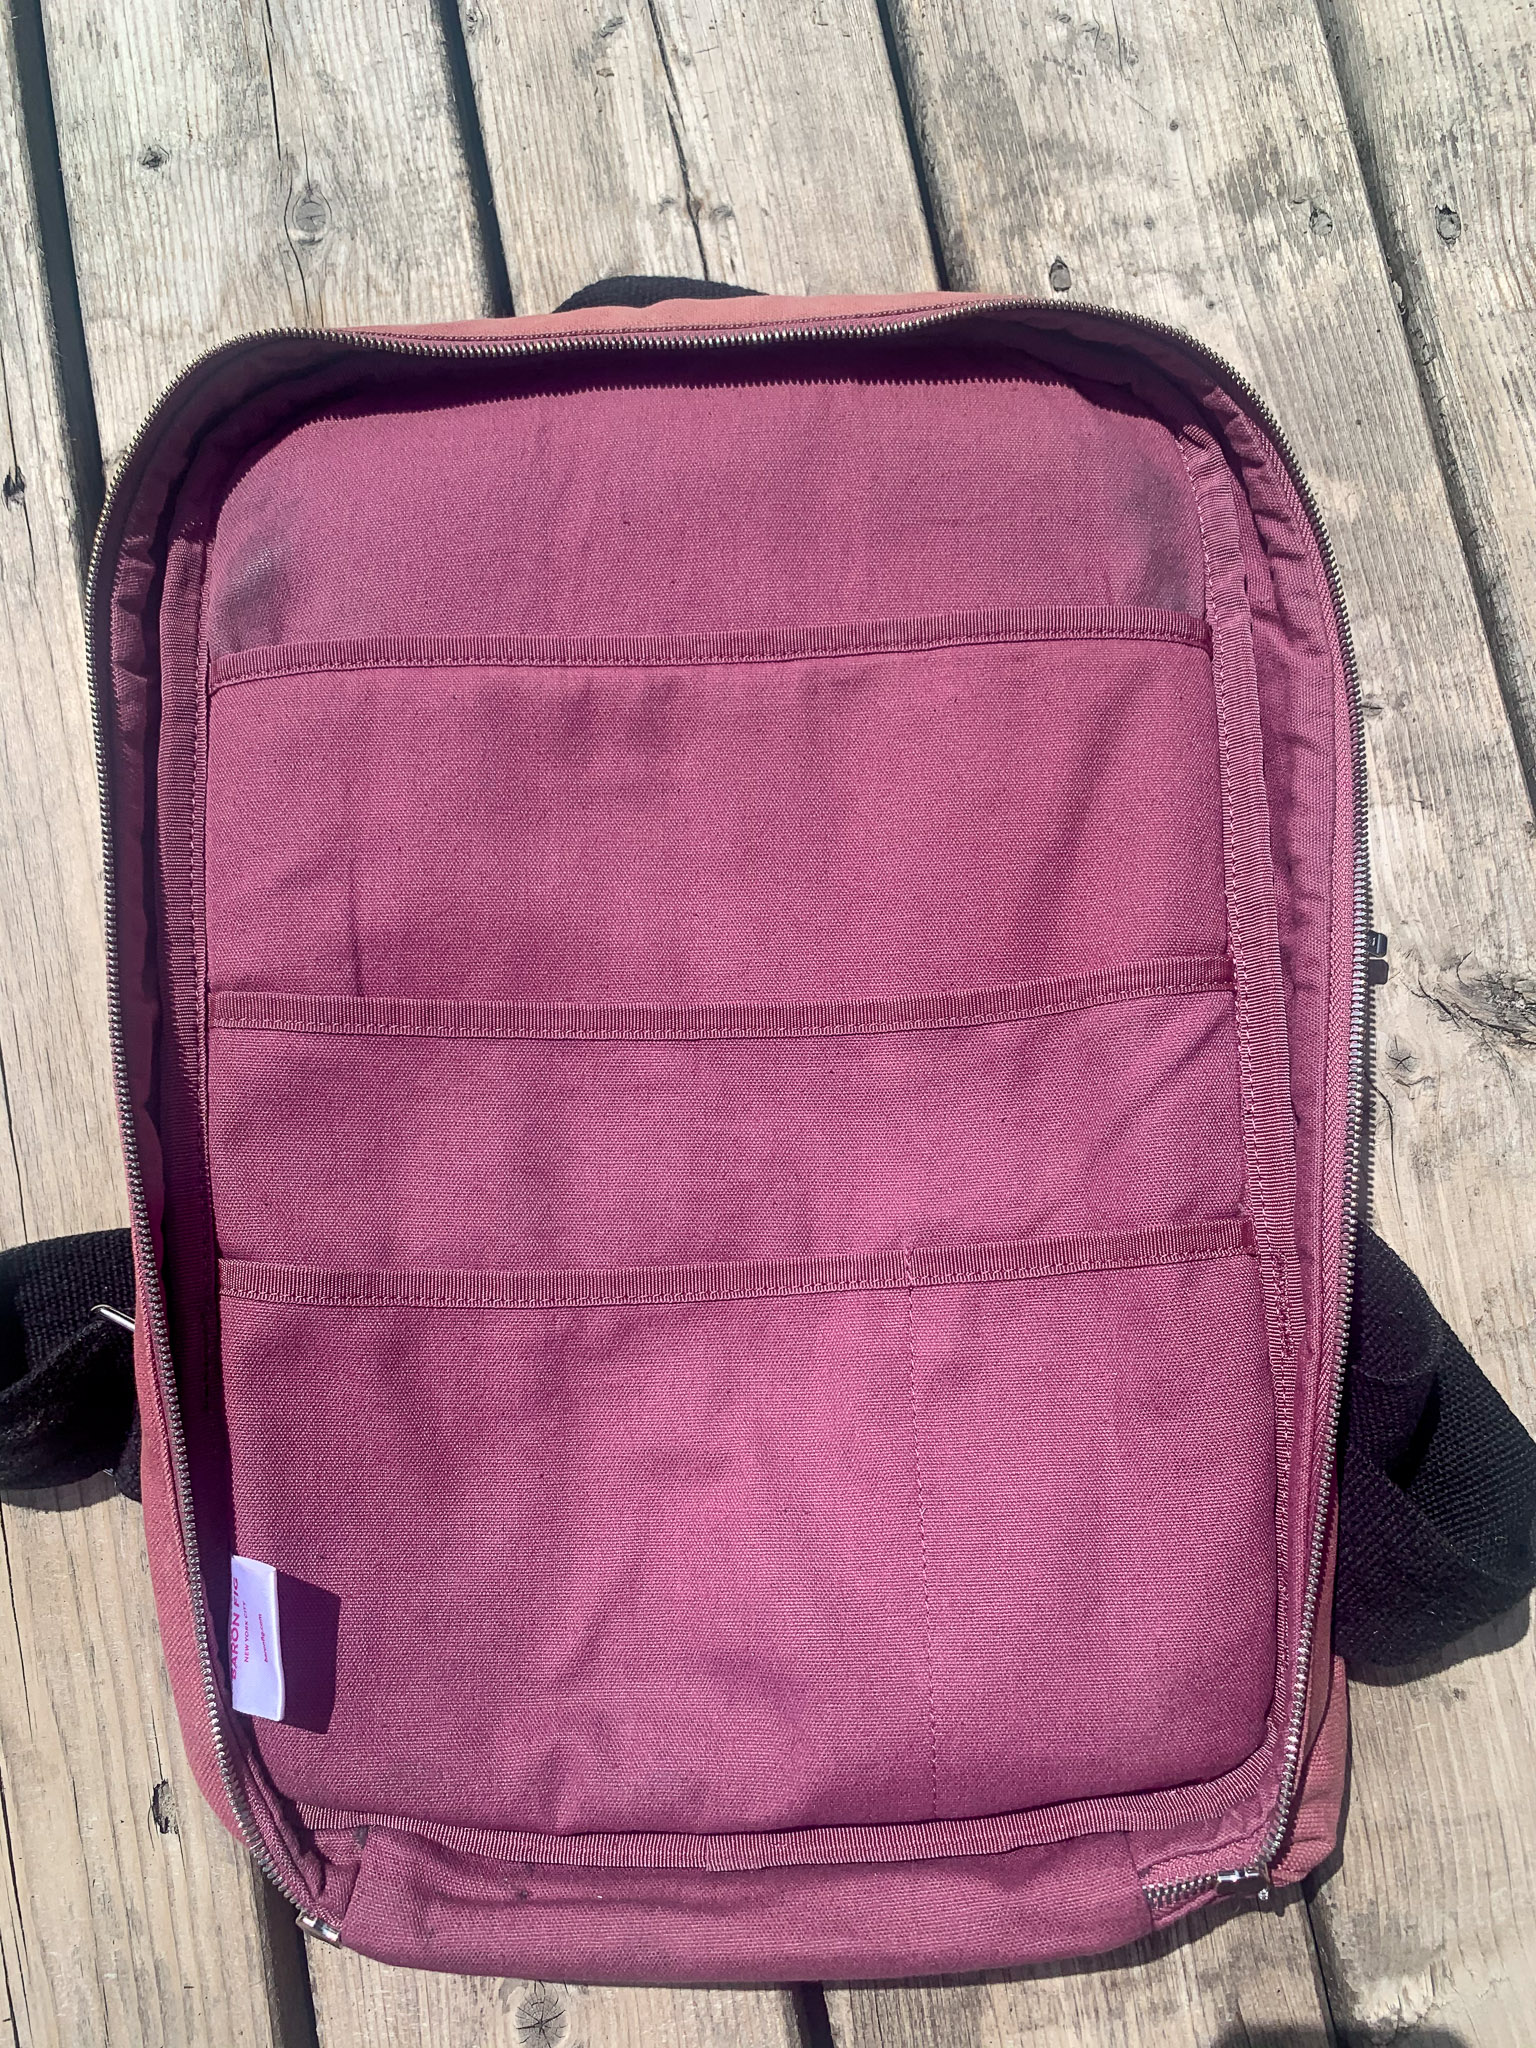 Baron Fig Bag Empty